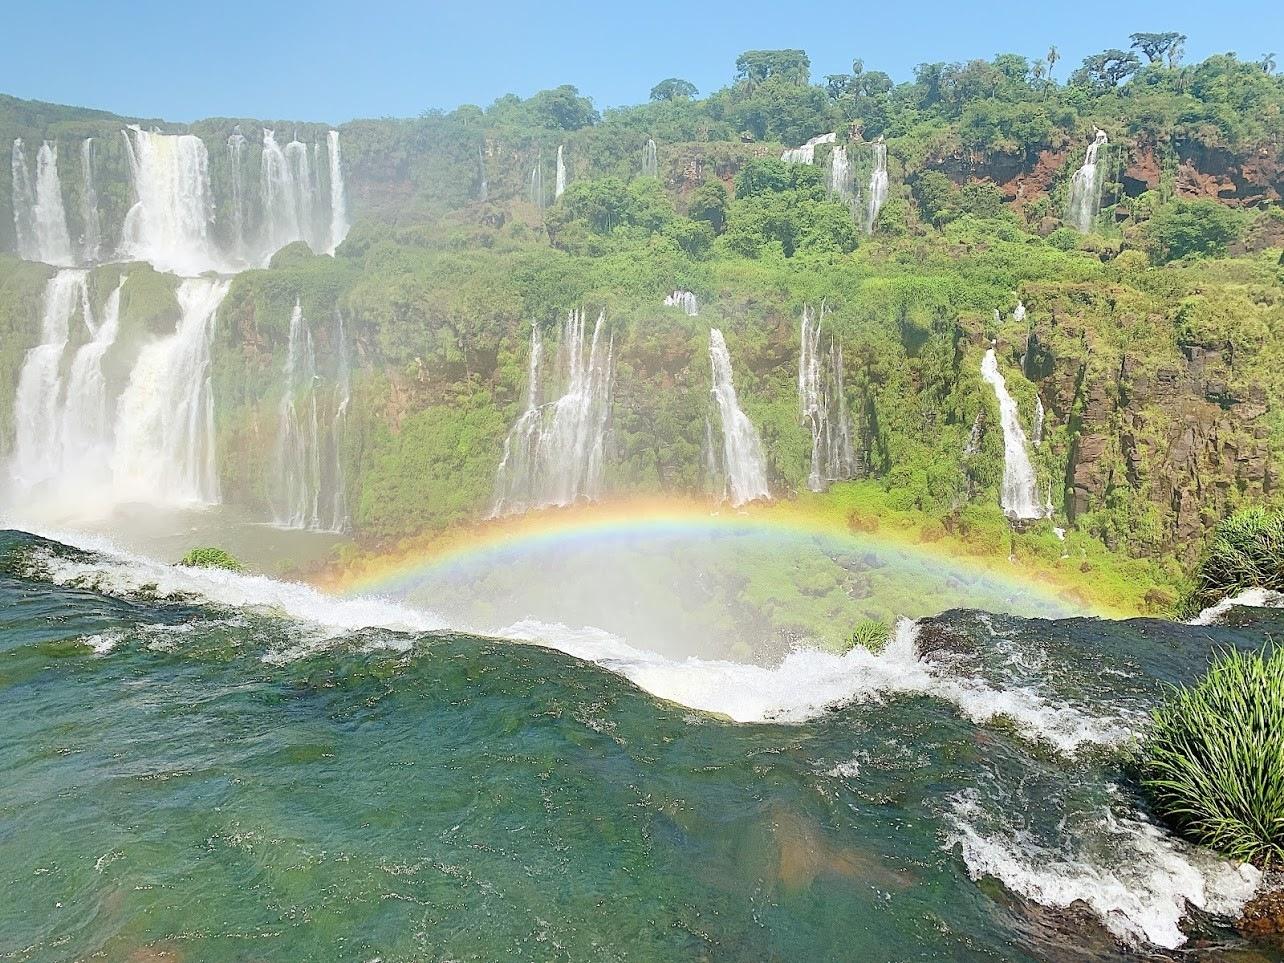 Taylor-Johnson-in-waterfalls2019-2-Large